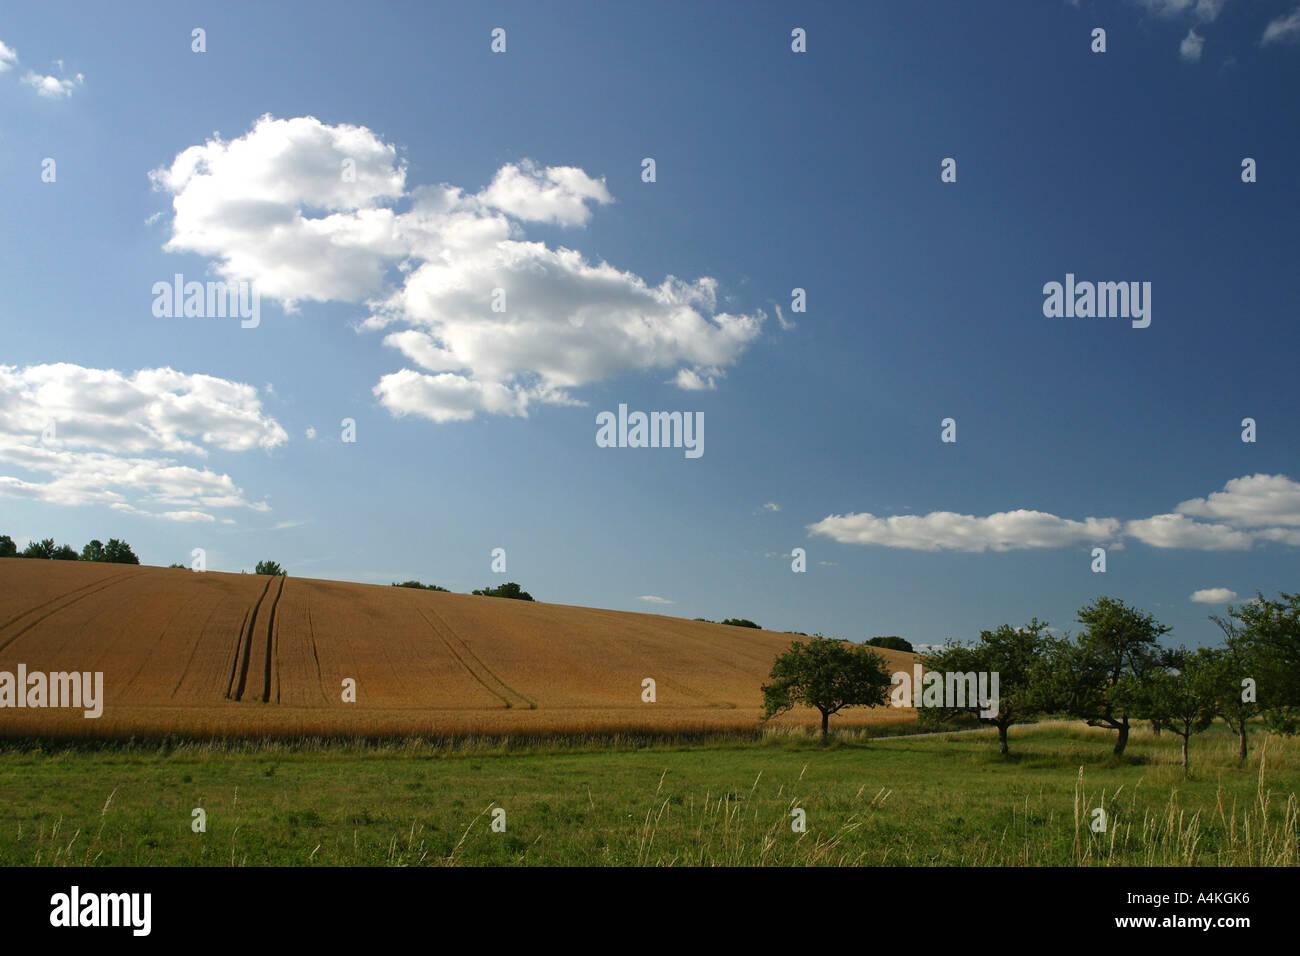 France, Jura, landscape - Stock Image